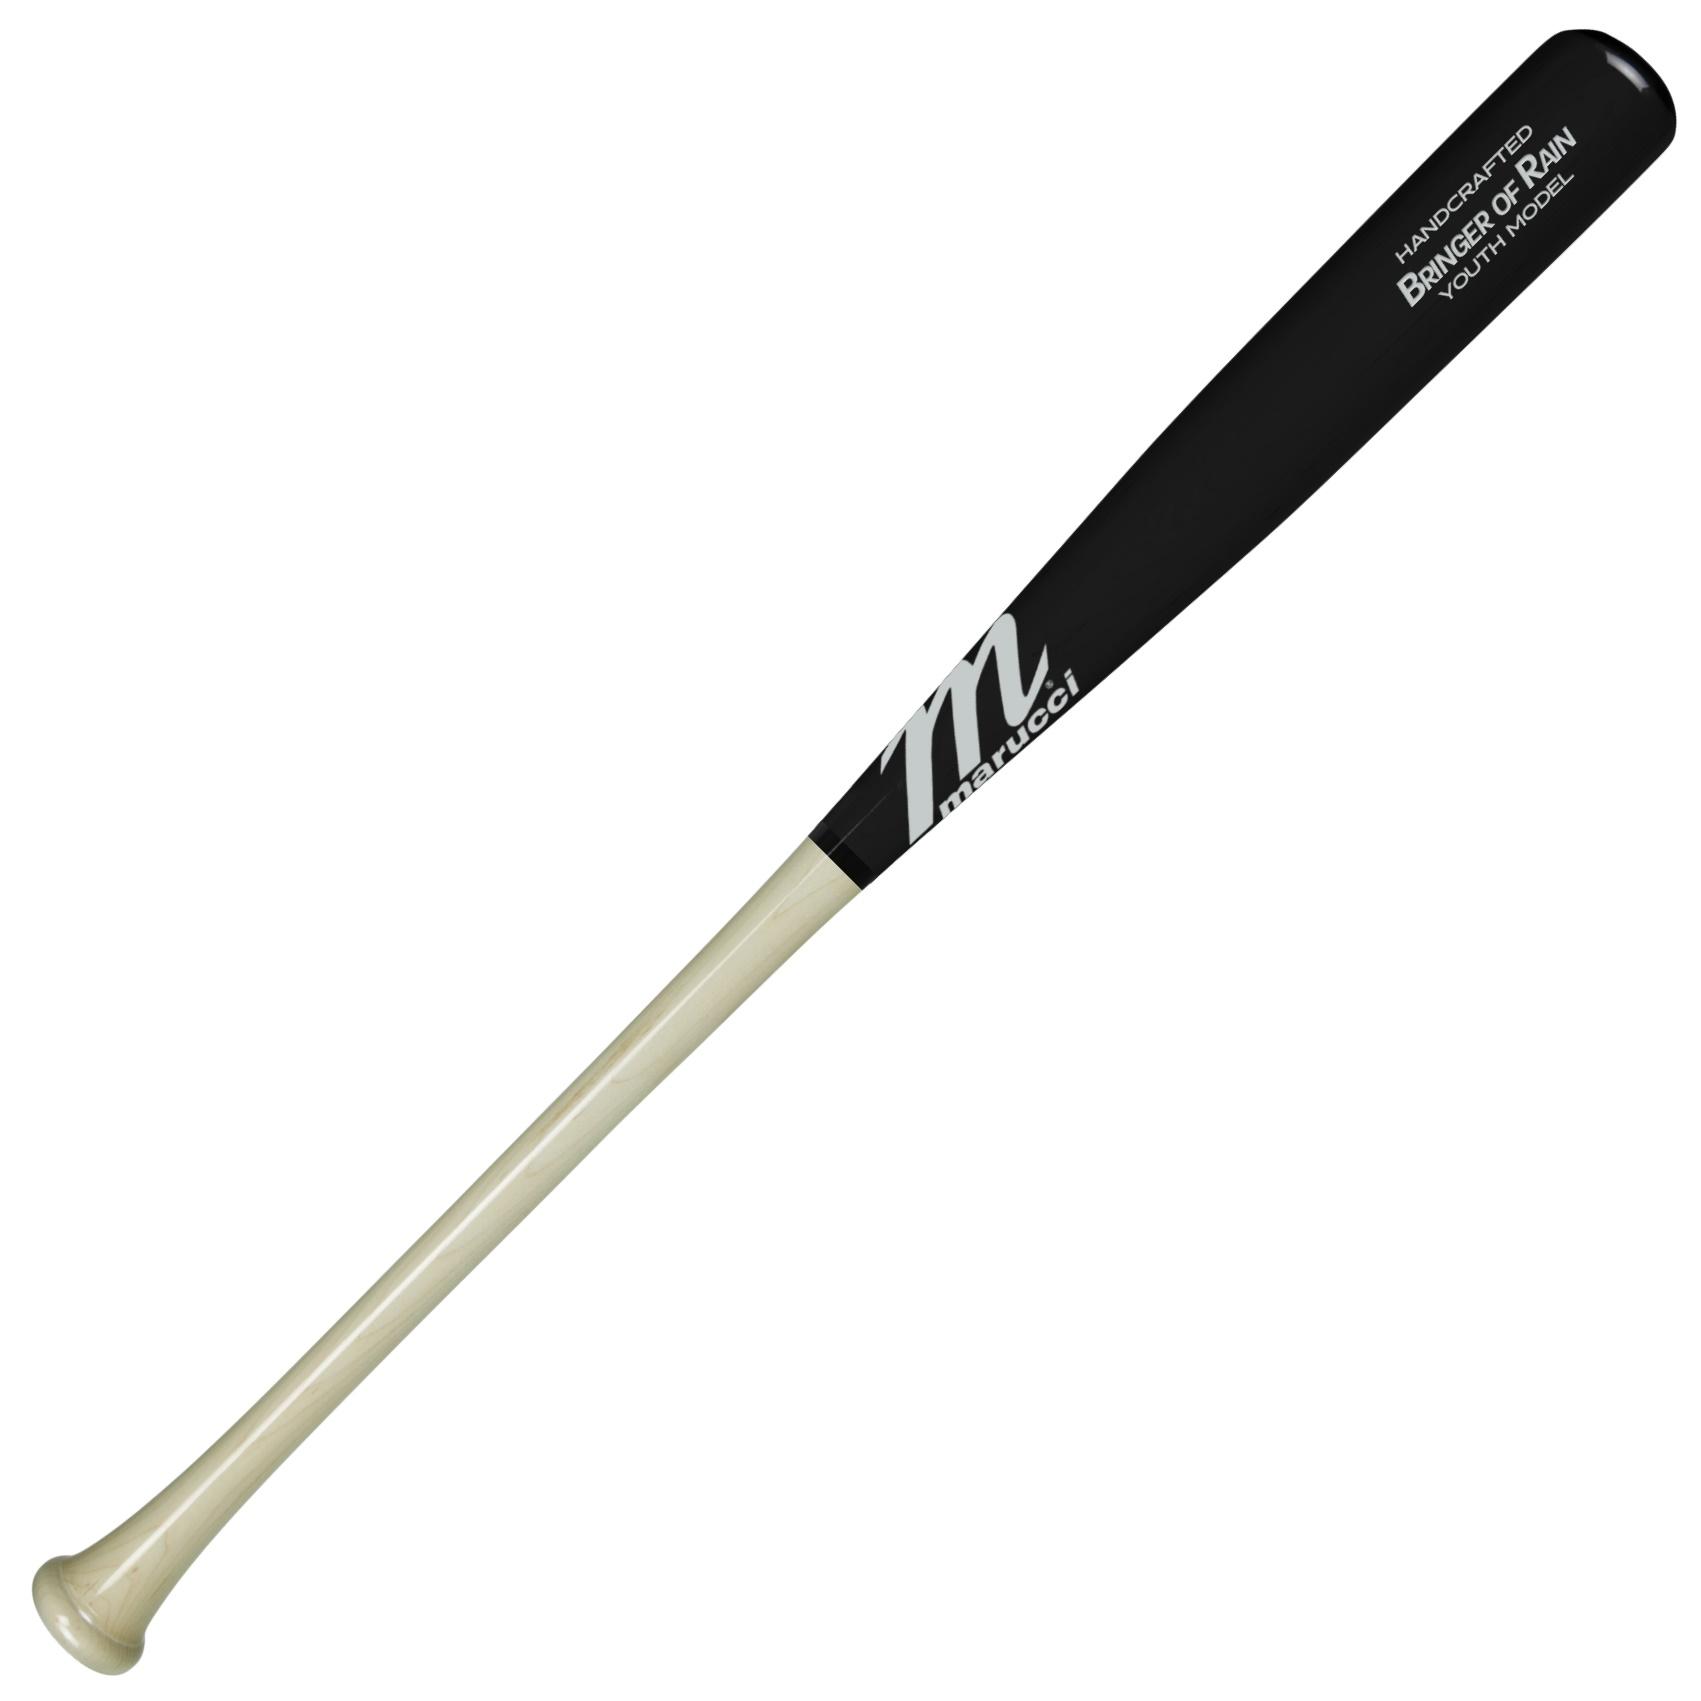 marucci-bringer-of-rain-youth-maple-wood-baseball-bat-27-inch MYVE2BOR-NBK-27 Marucci 840058700794 <h1 class=productView-title-lower>YOUTH JOSH DONALDSON BRINGER OF RAIN PRO MODEL</h1> <span>The Bringer